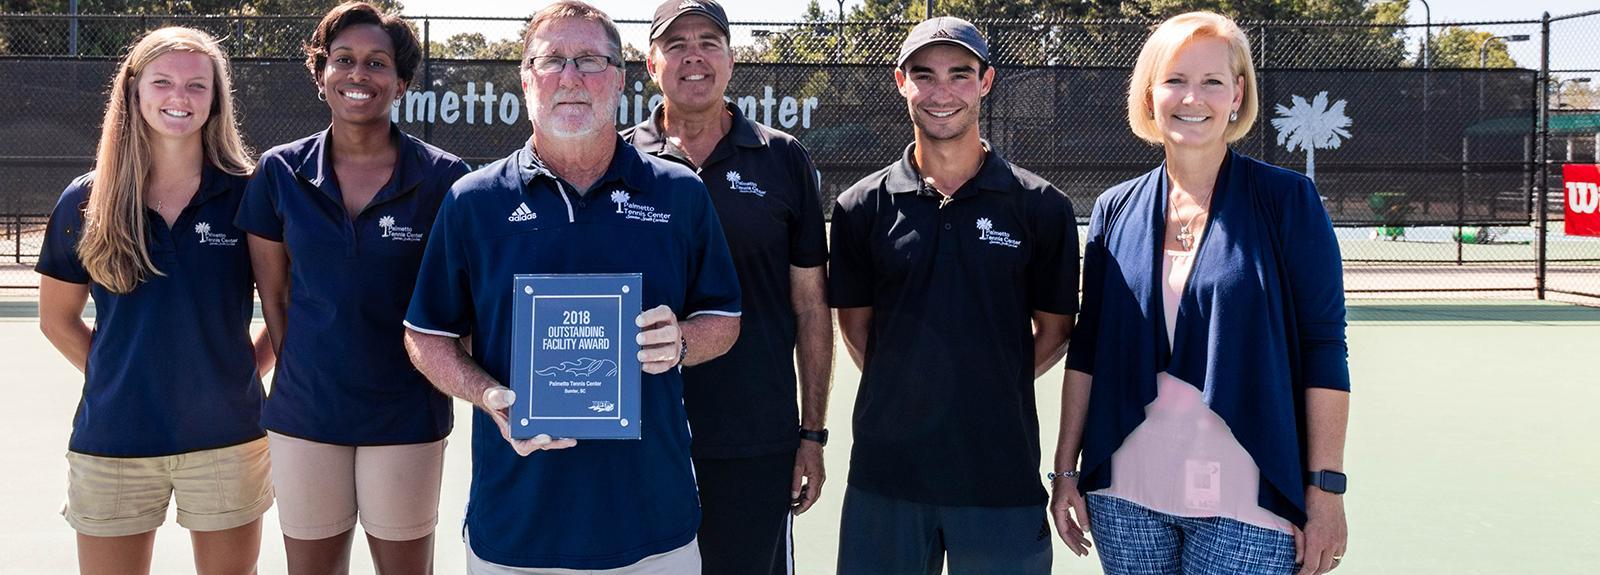 Palmetto Tennis Center Staff Pose with Award Plaque